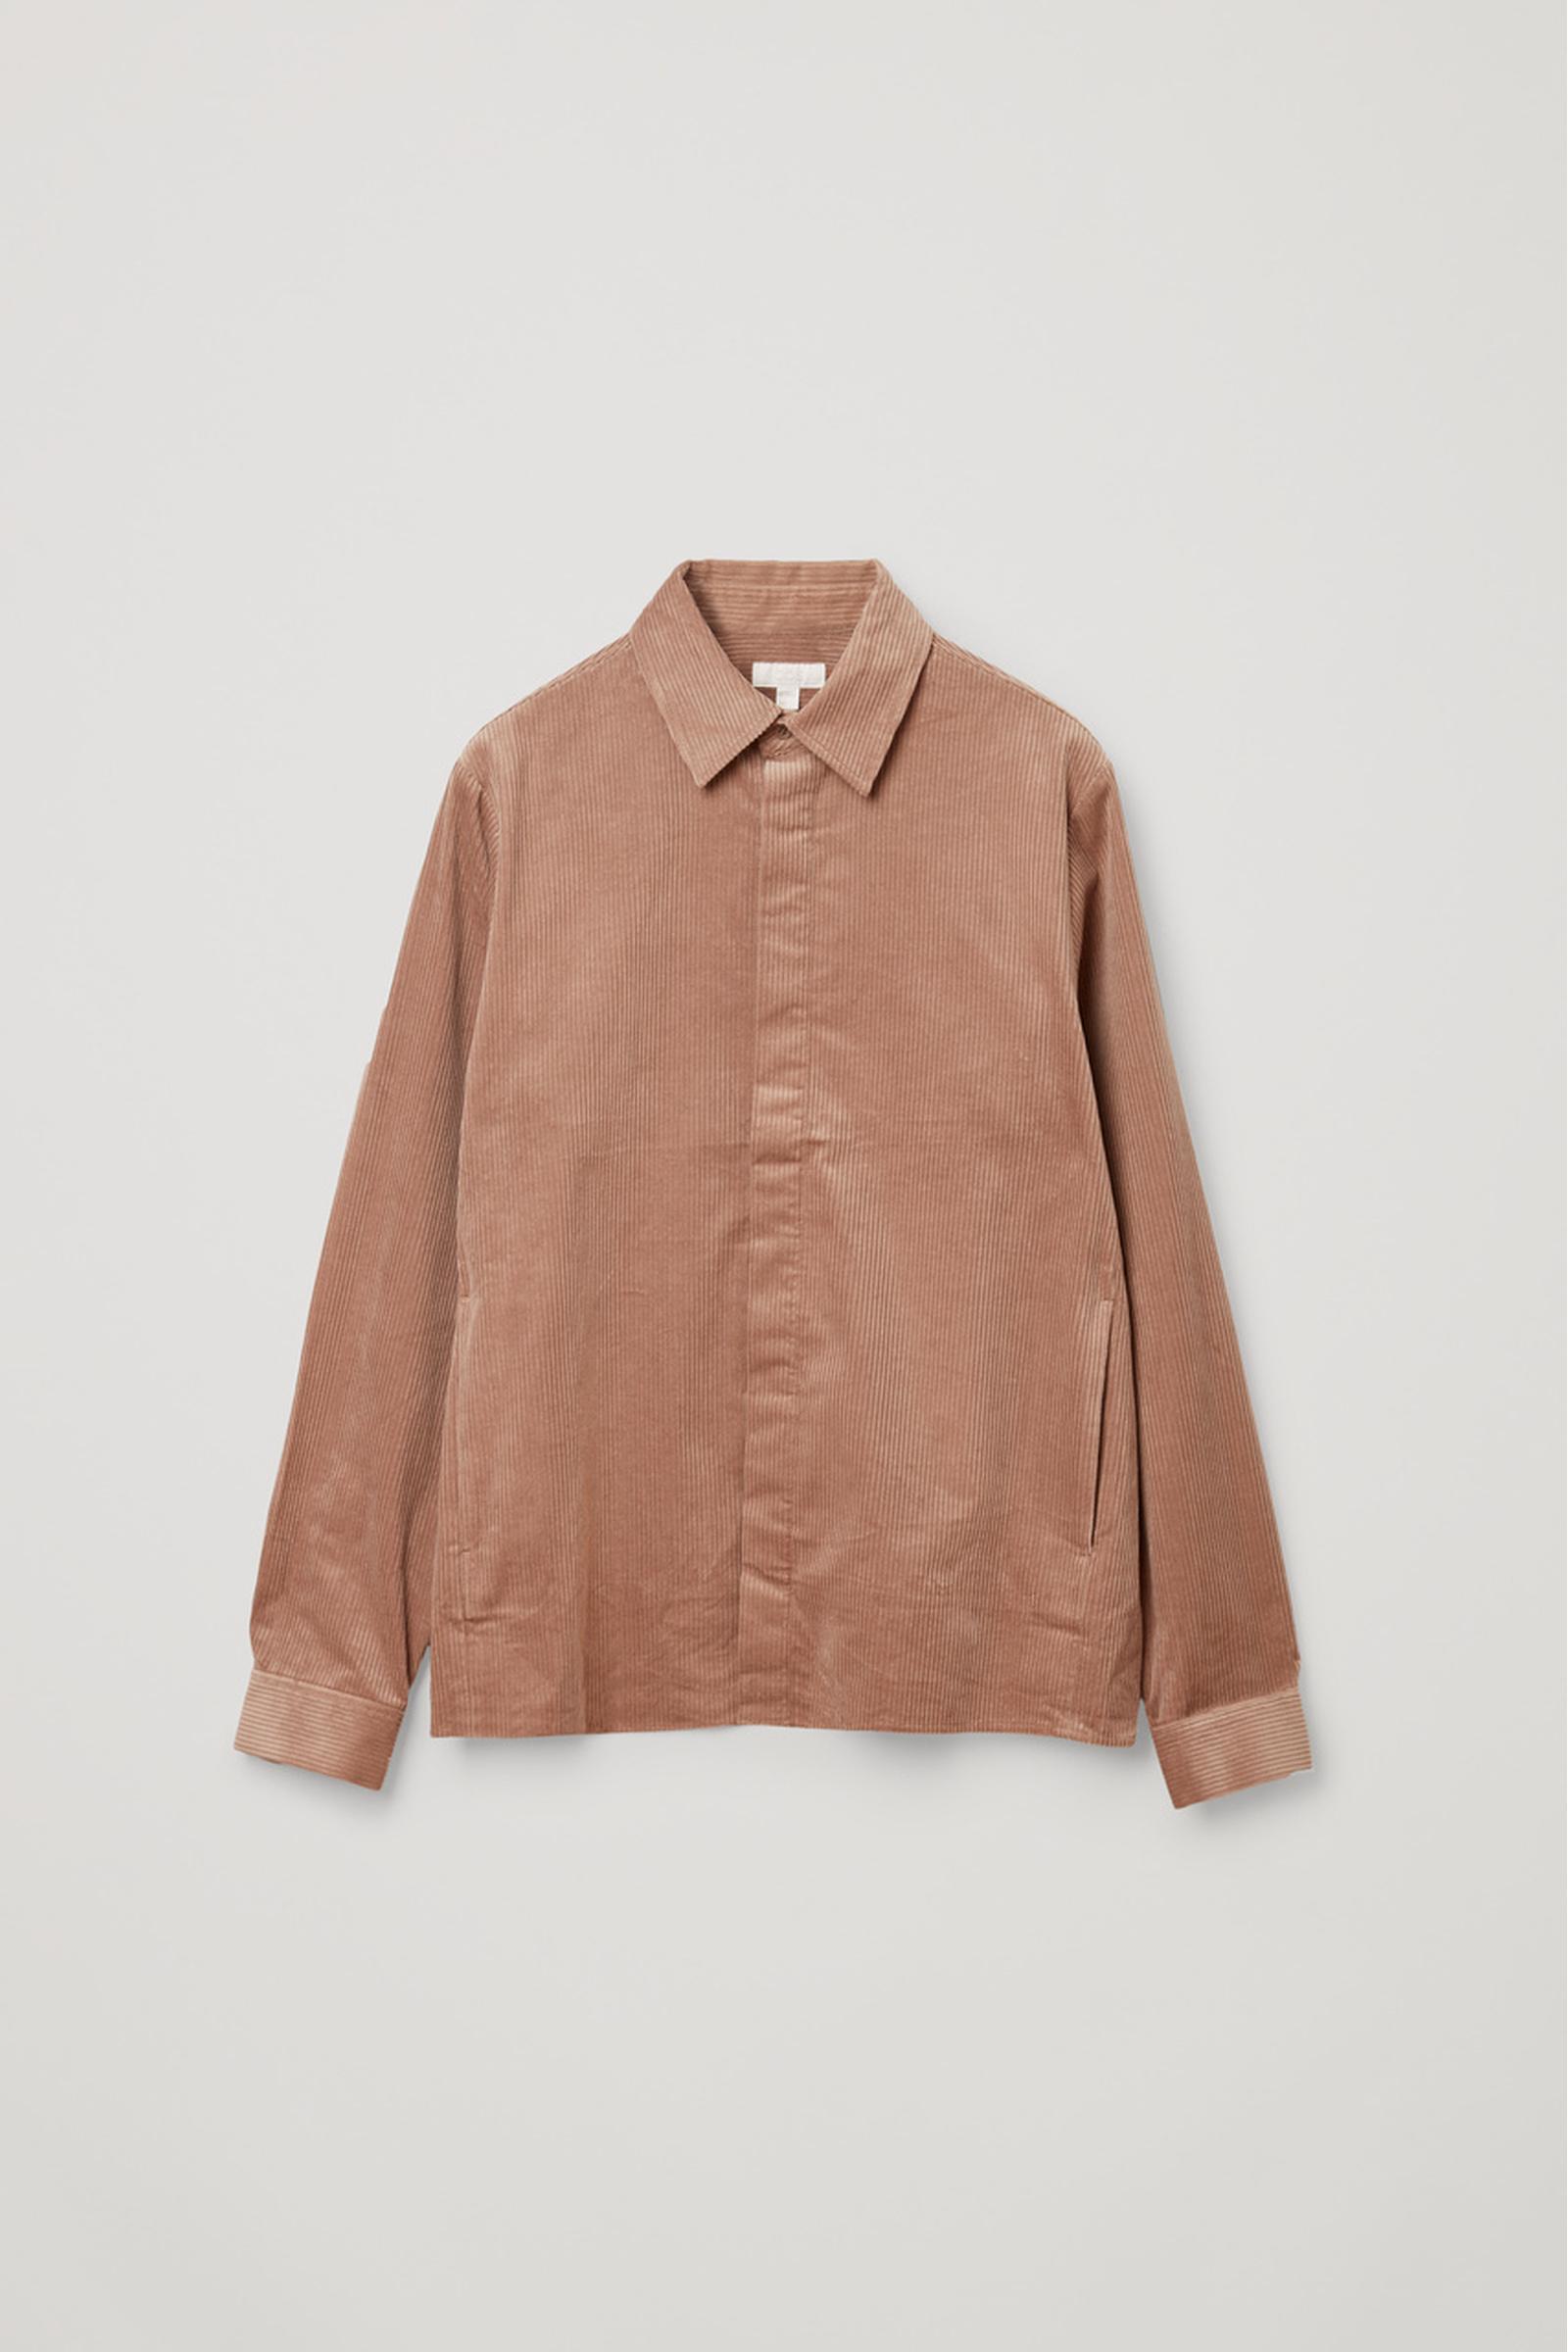 COS 코튼 코듀로이 셔츠의 브라운컬러 Product입니다.